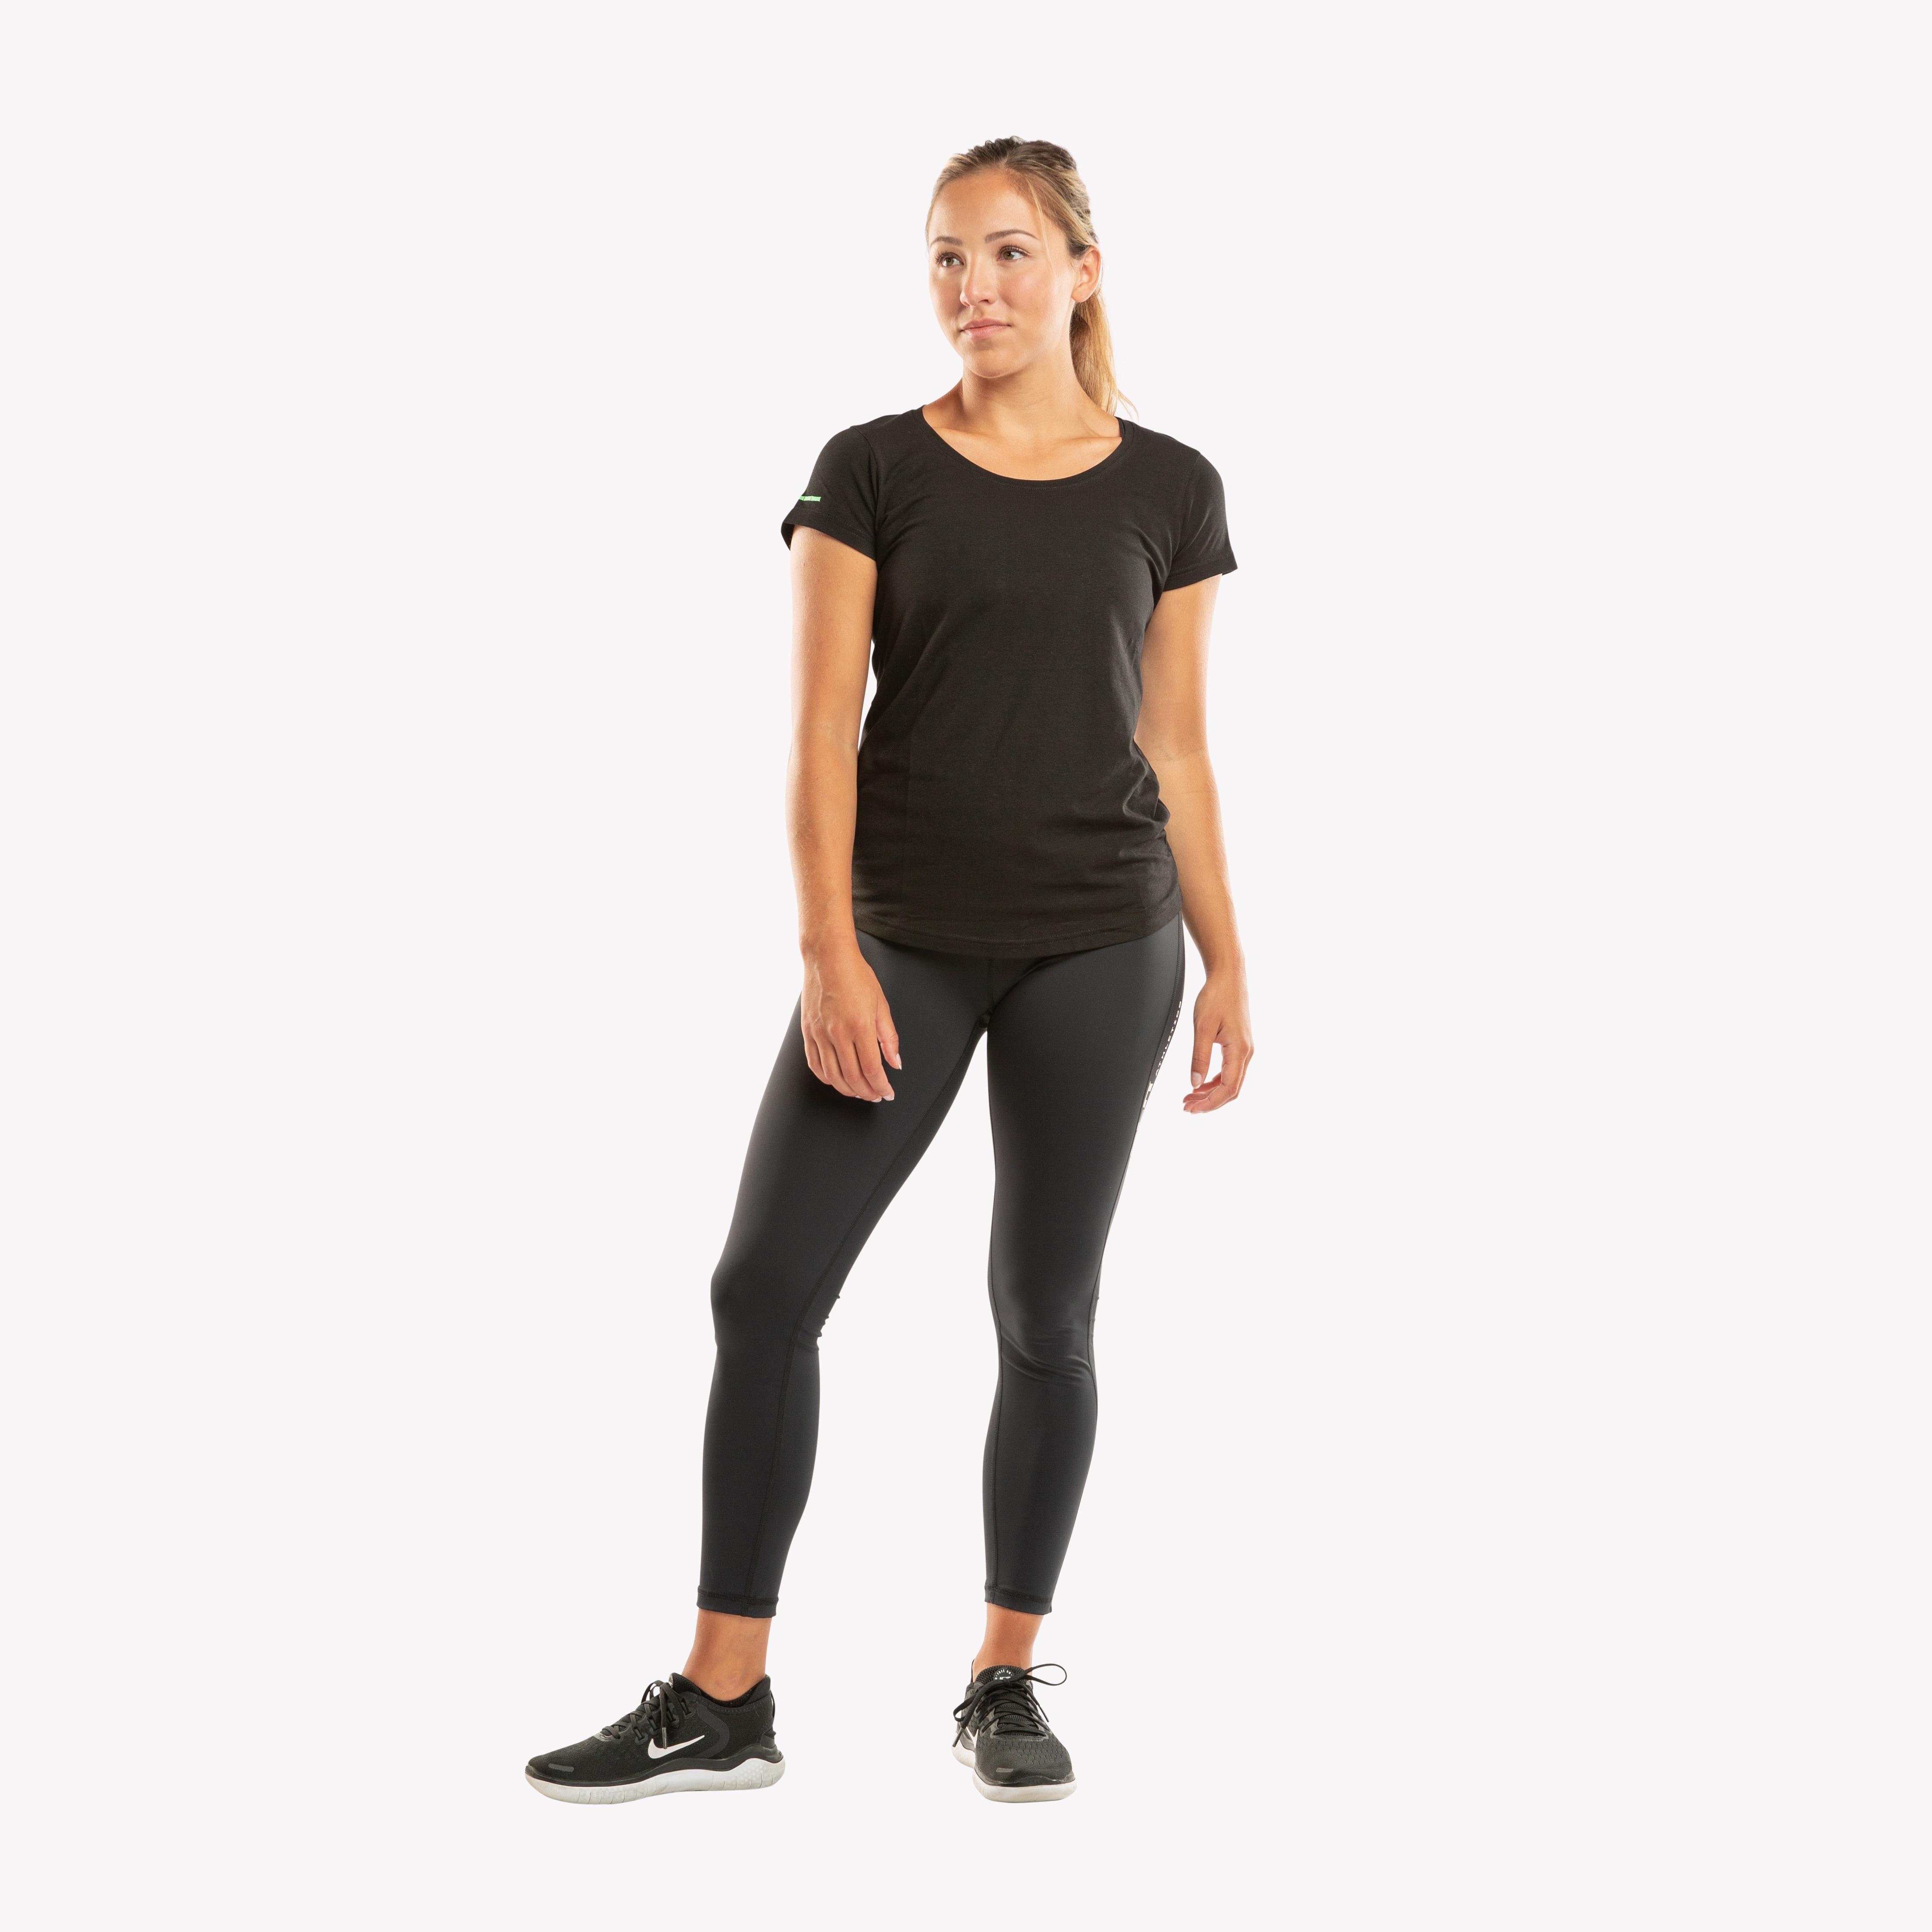 CLN Bamboo ws T-shirt Shadow